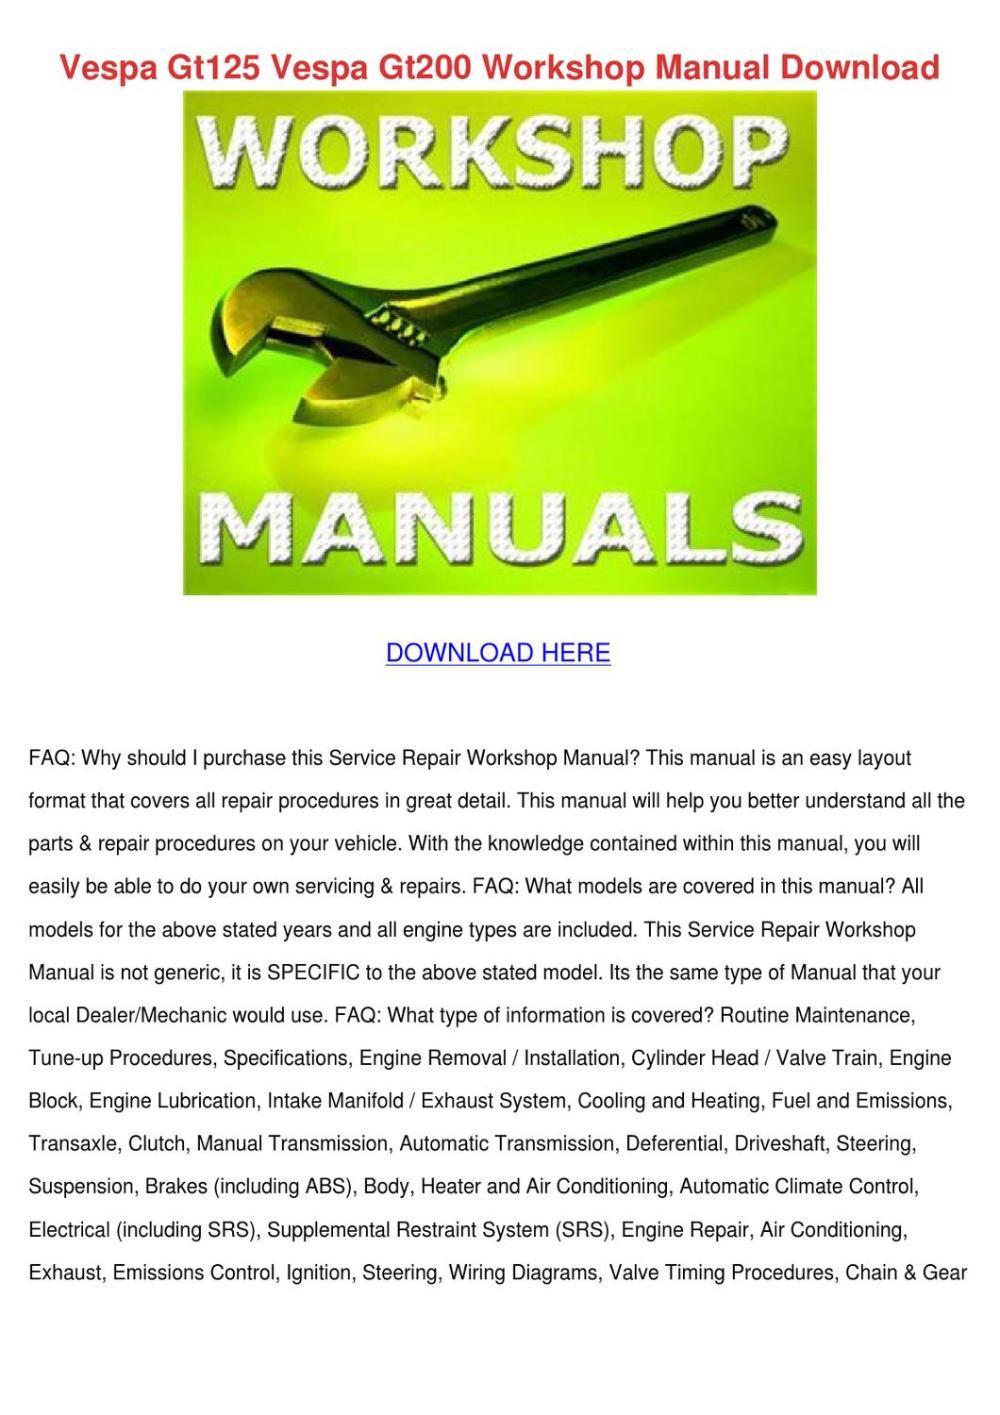 medium resolution of vespa gt125 vespa gt200 workshop manual downl